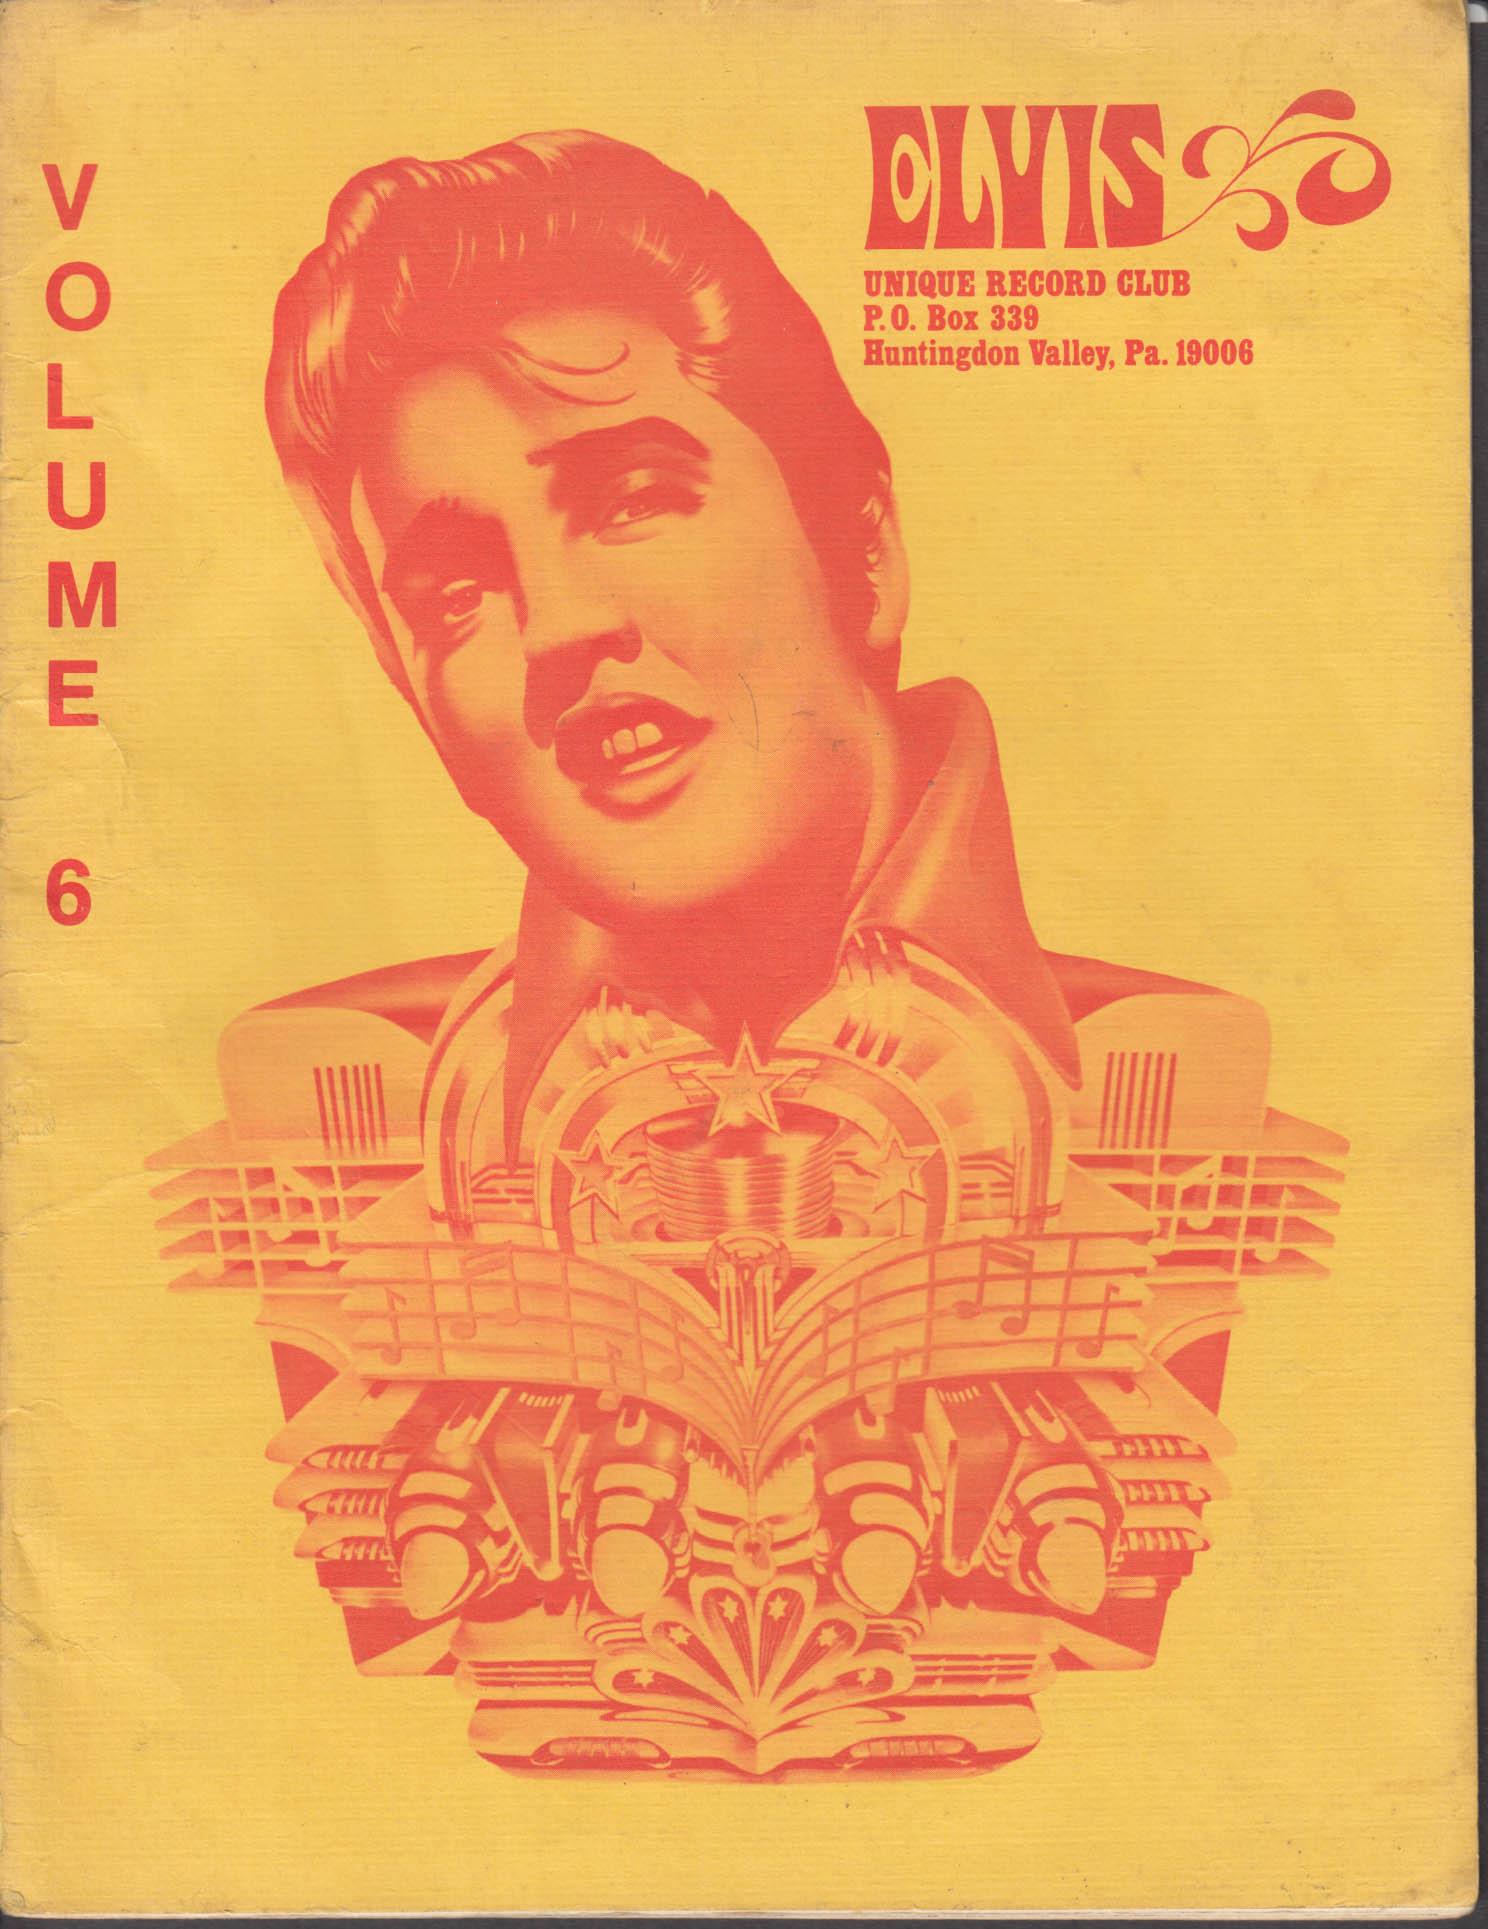 ELVIS UNIQUE RECORD CLUB V6 1977 Huntington Valley PA